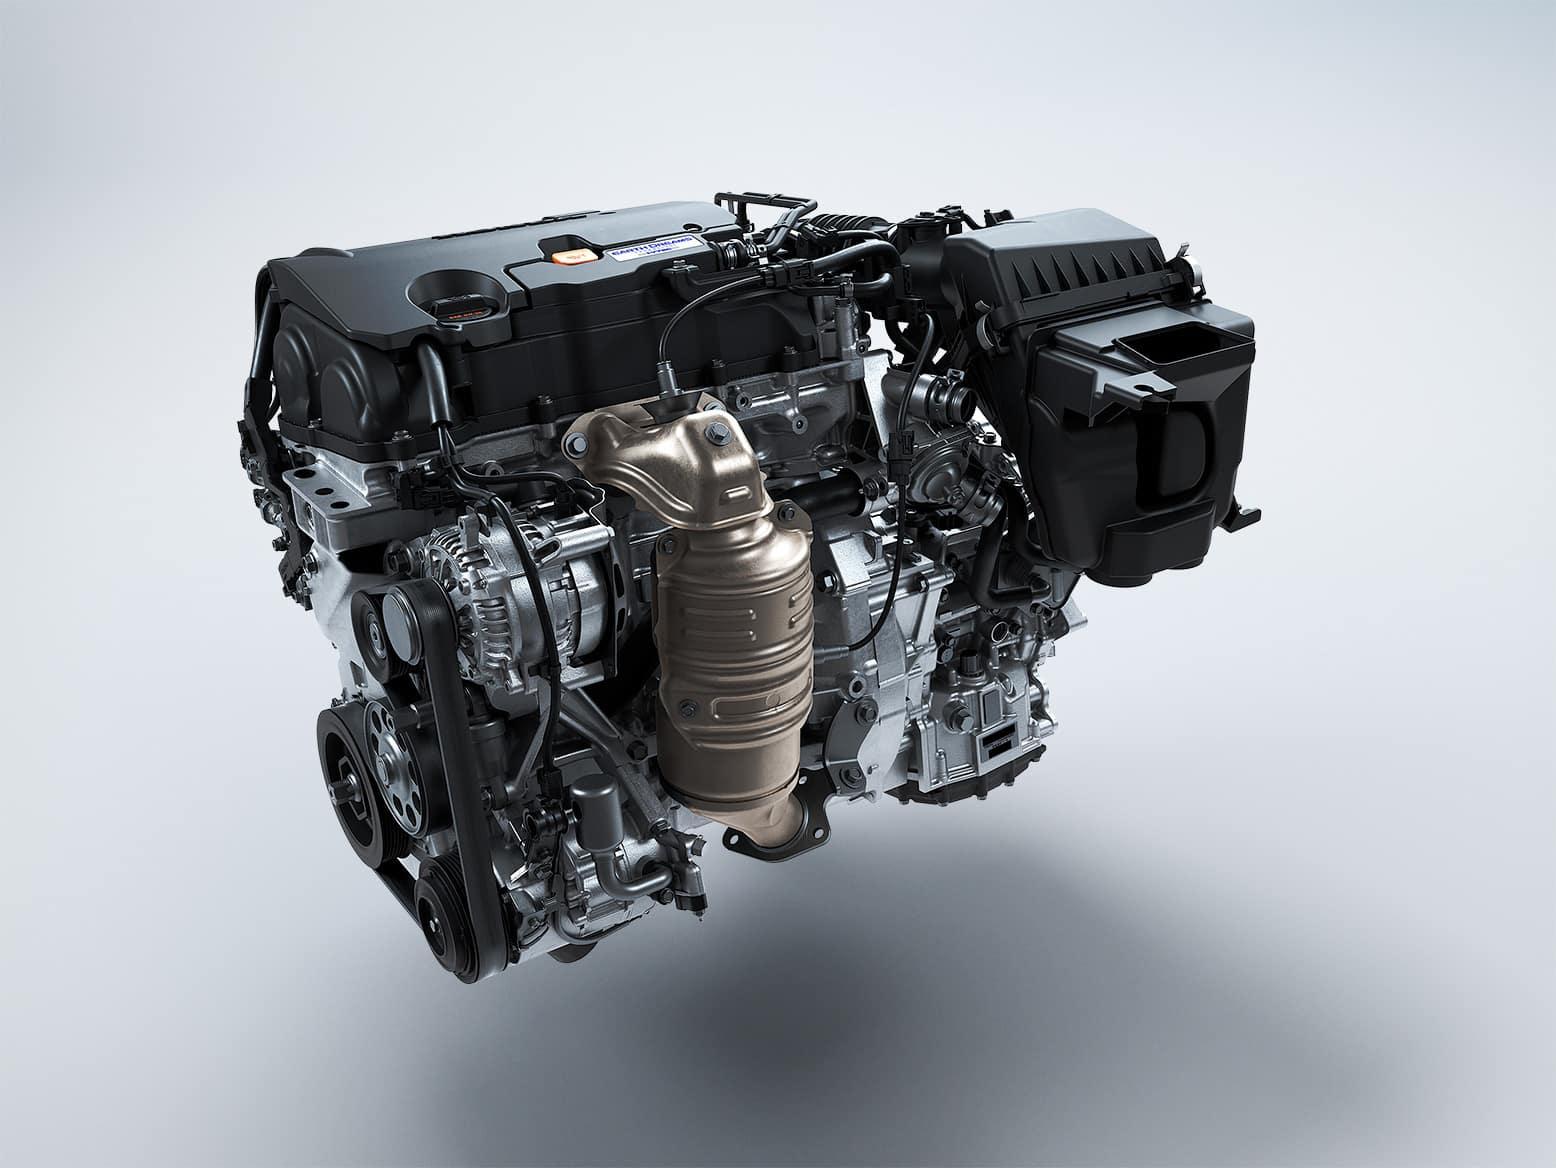 2022 Civic Hatchback with 158 horsepower 4 cylinder engine